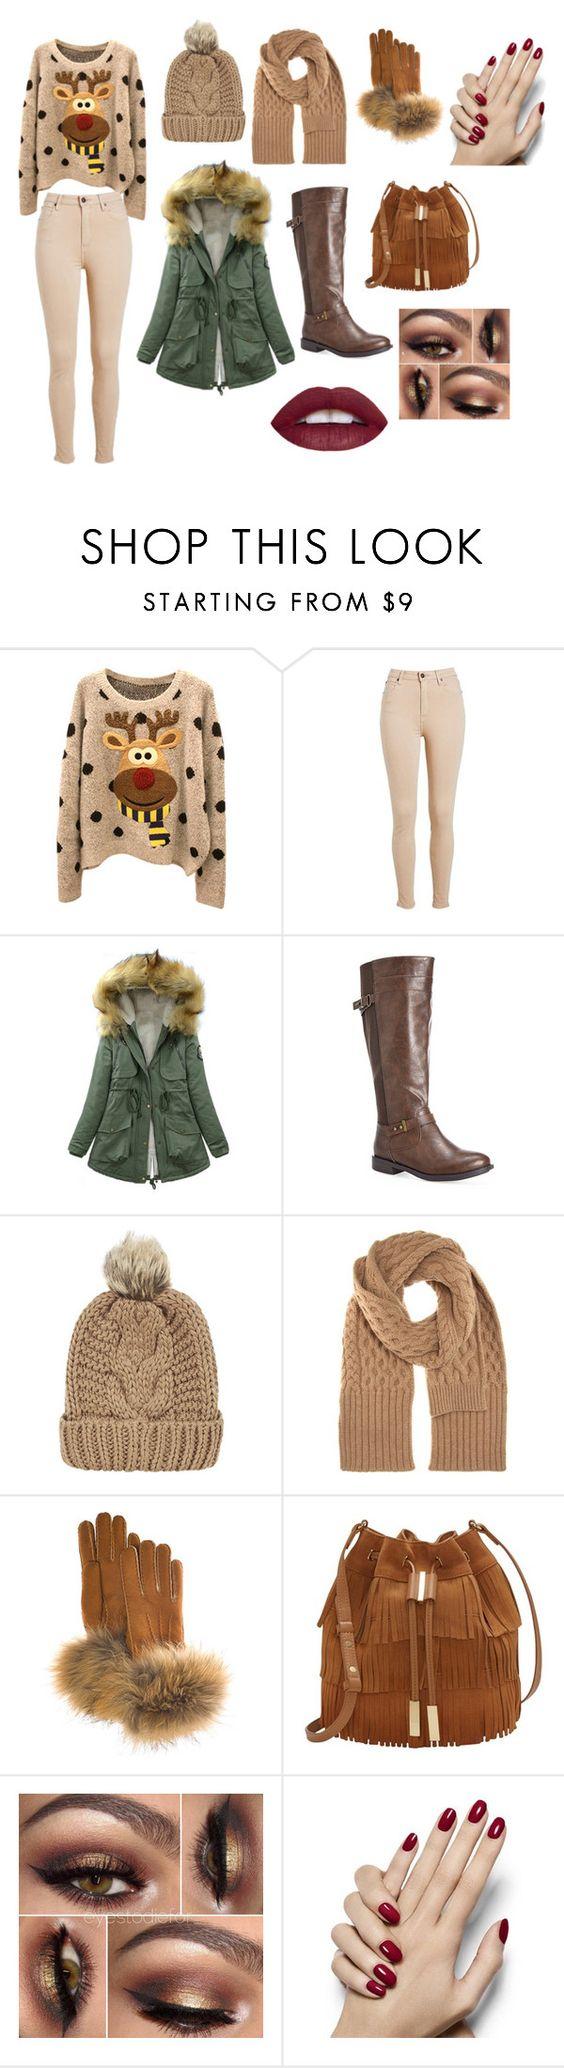 """Untitled #78"" by danija-skrebo ❤ liked on Polyvore featuring Avenue, Chicnova Fashion, Maison Margiela, FRR, Vince Camuto, women's clothing, women's fashion, women, female and woman"